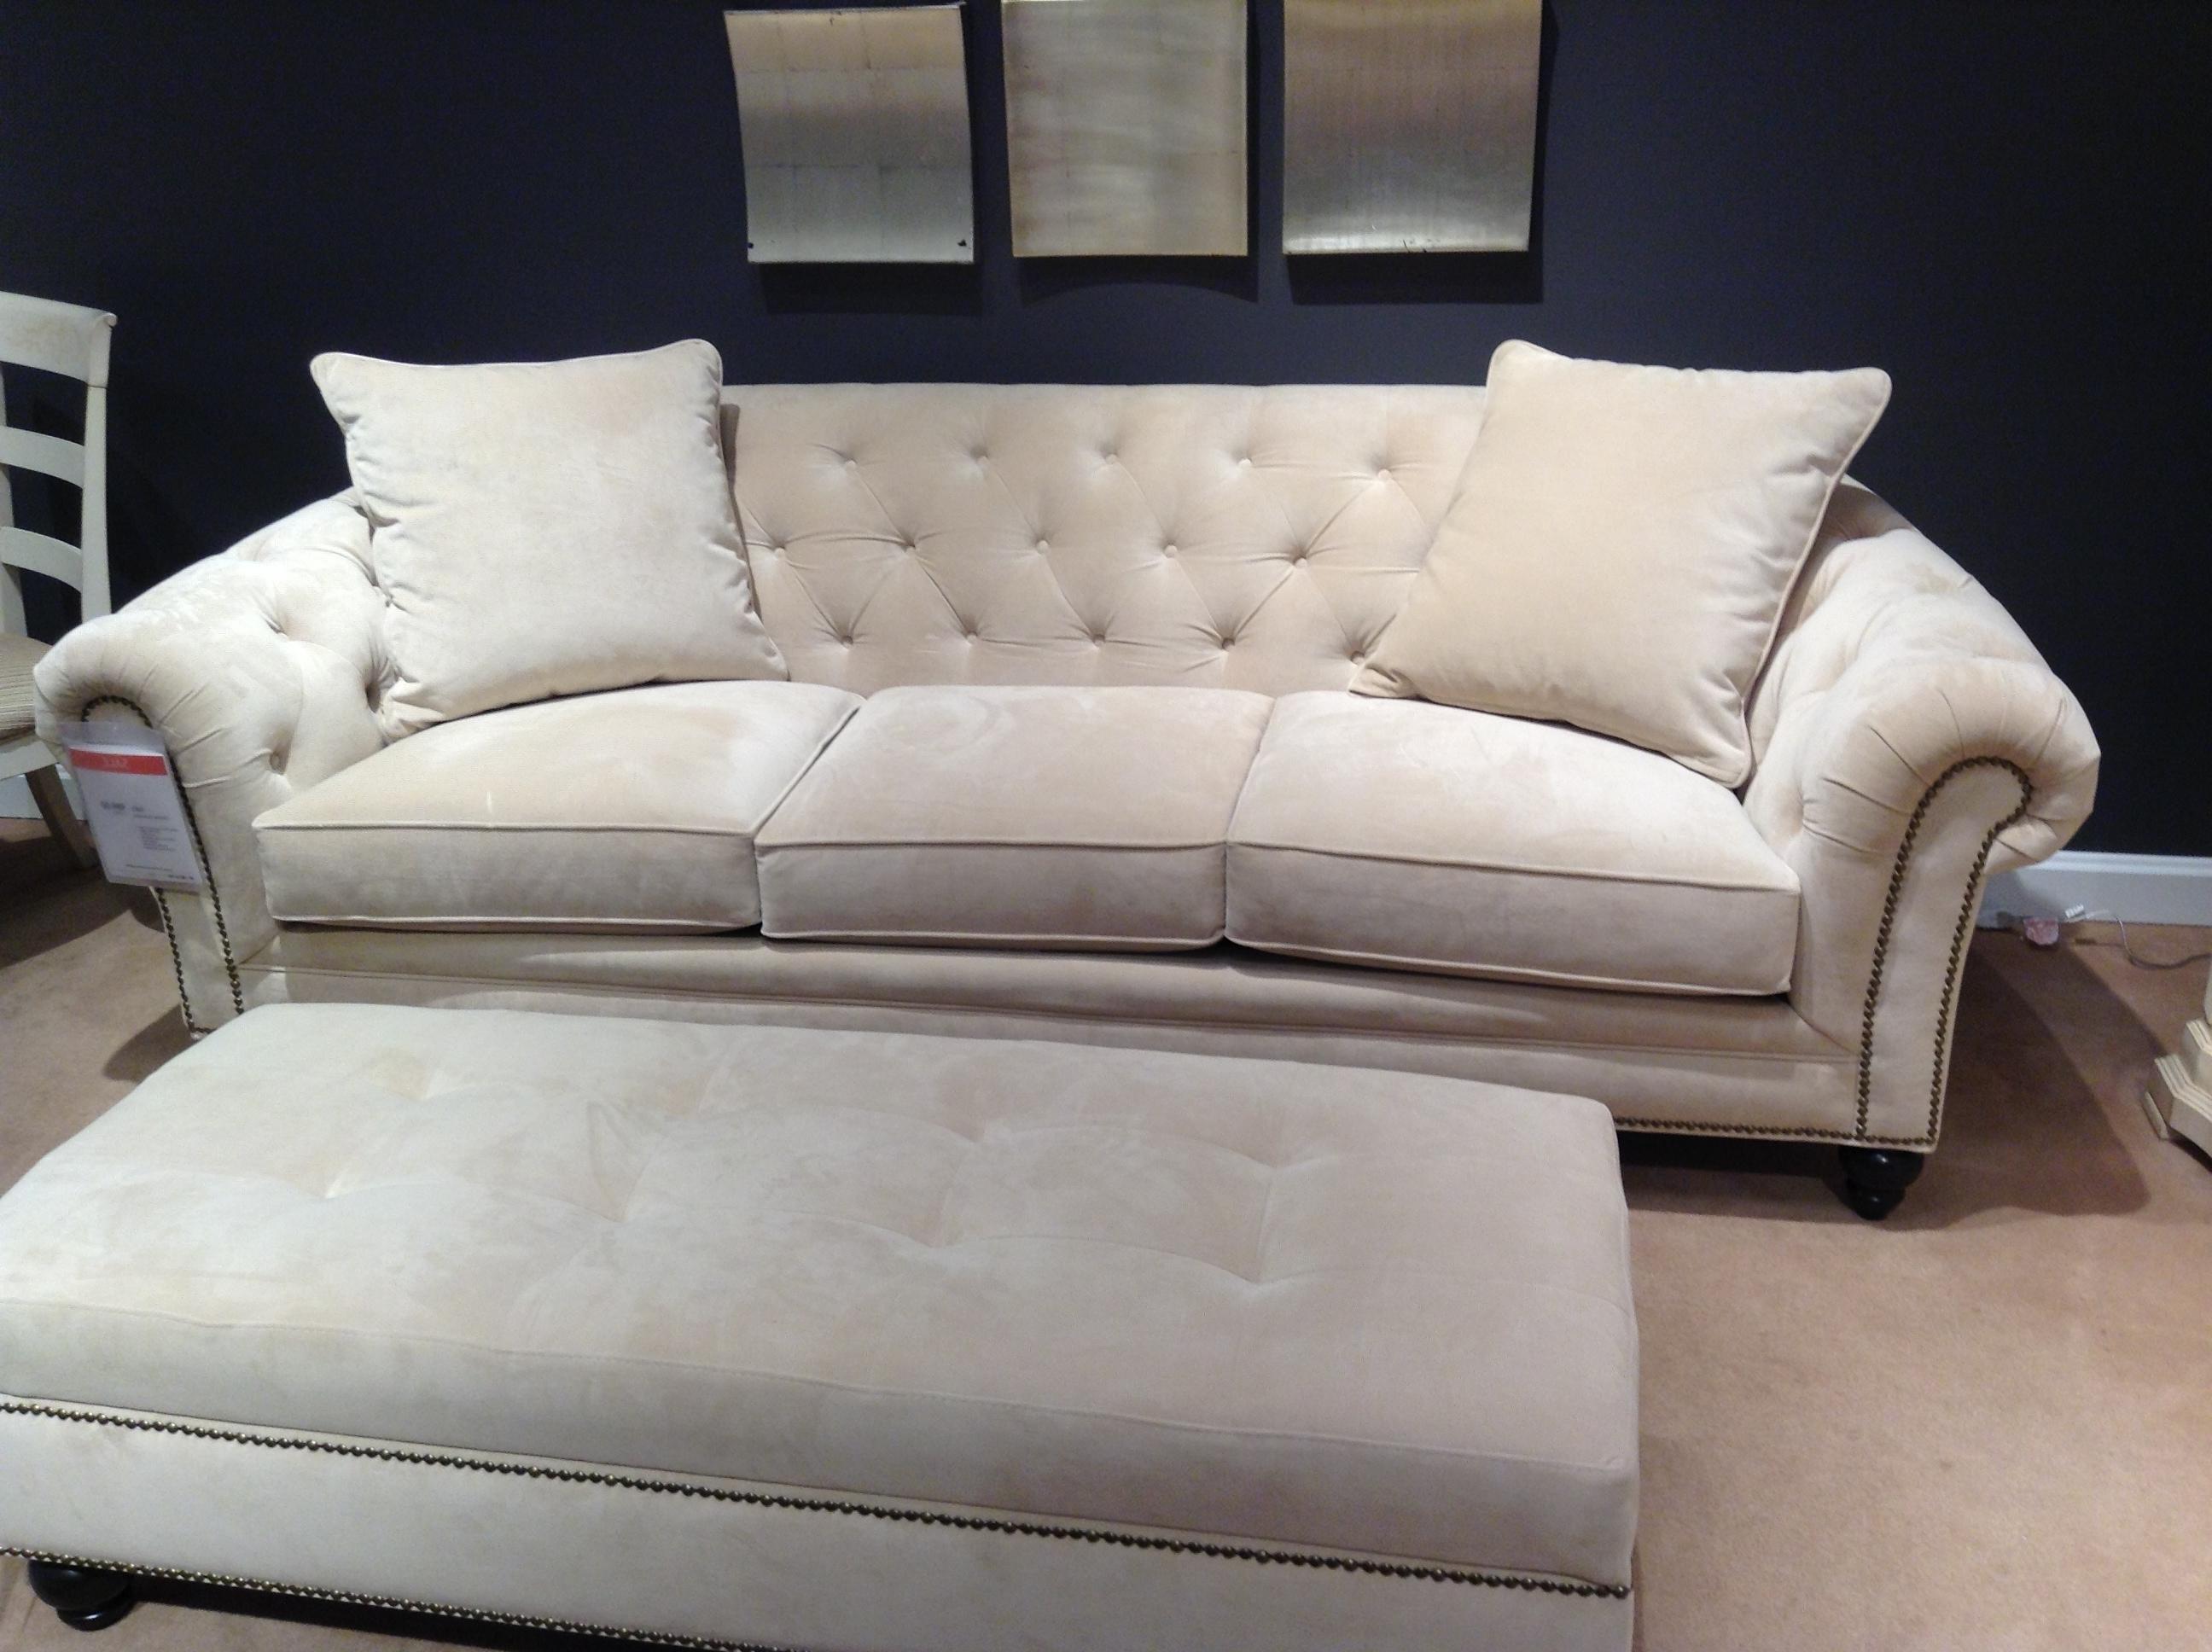 Macys Sofas Inside 2018 Elliot Sofa Bed Macy's • Sofa Bed (View 14 of 20)